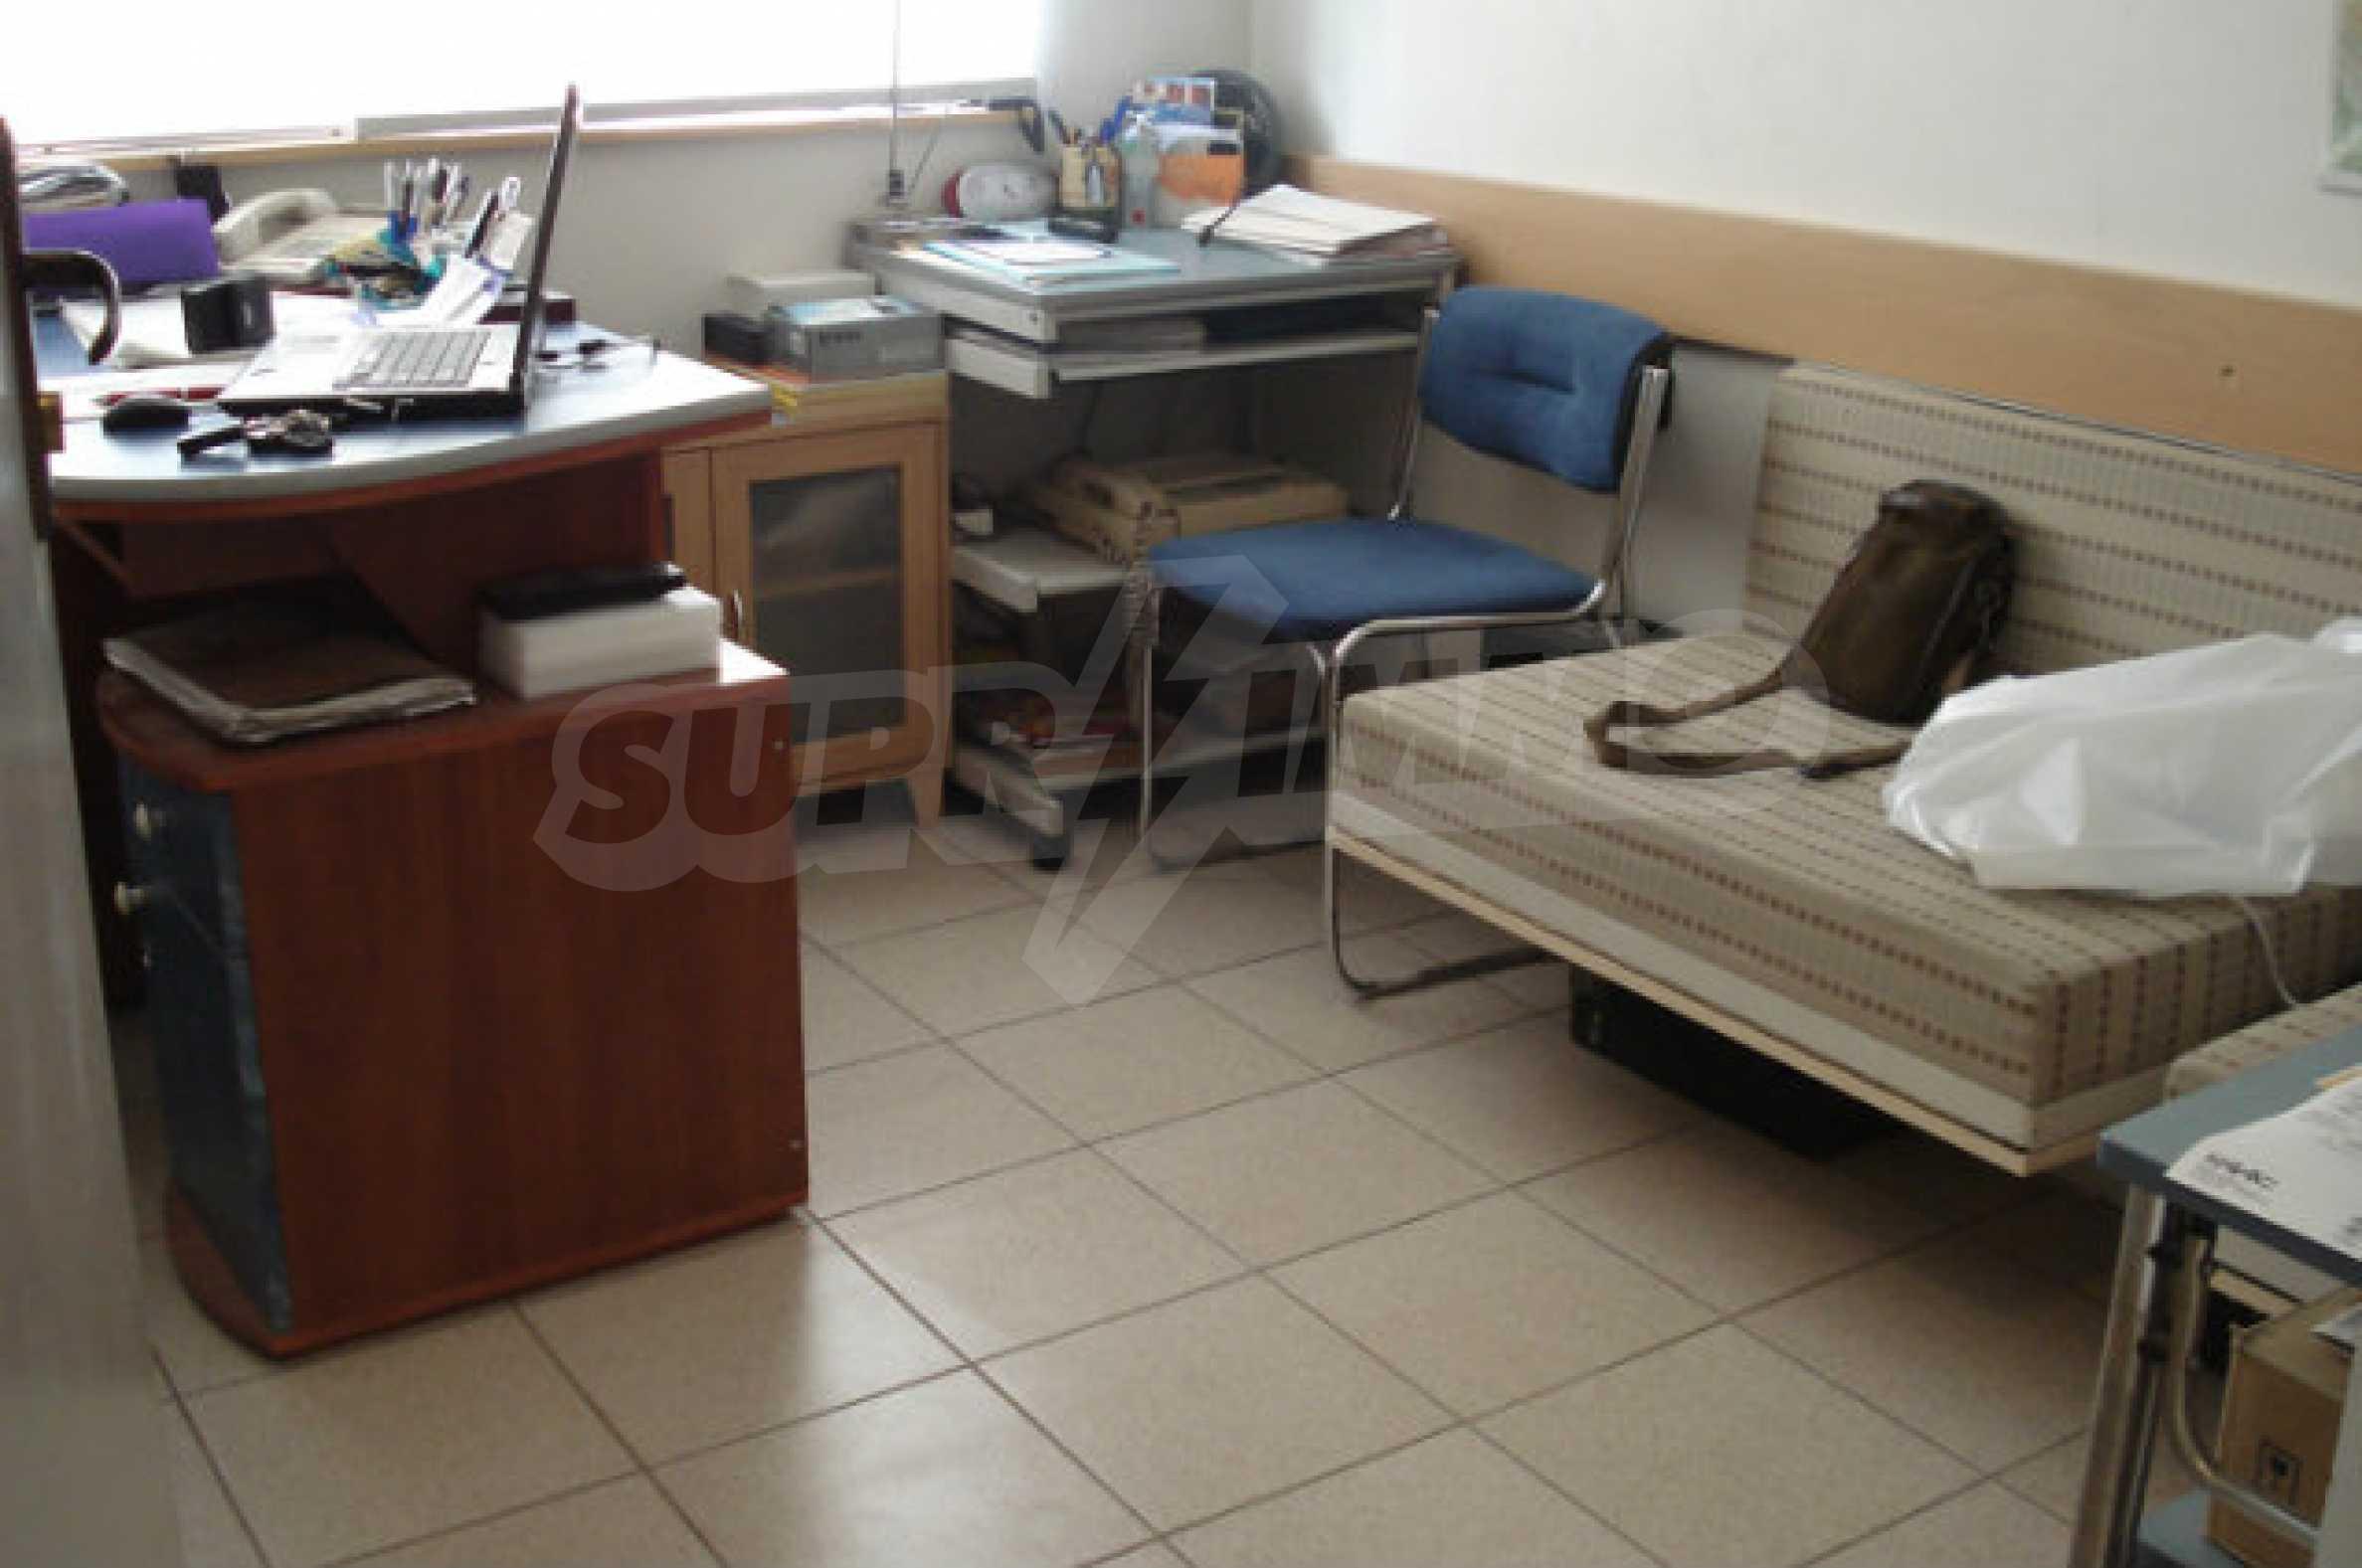 An office building in the center of Veliko Tarnovo 3